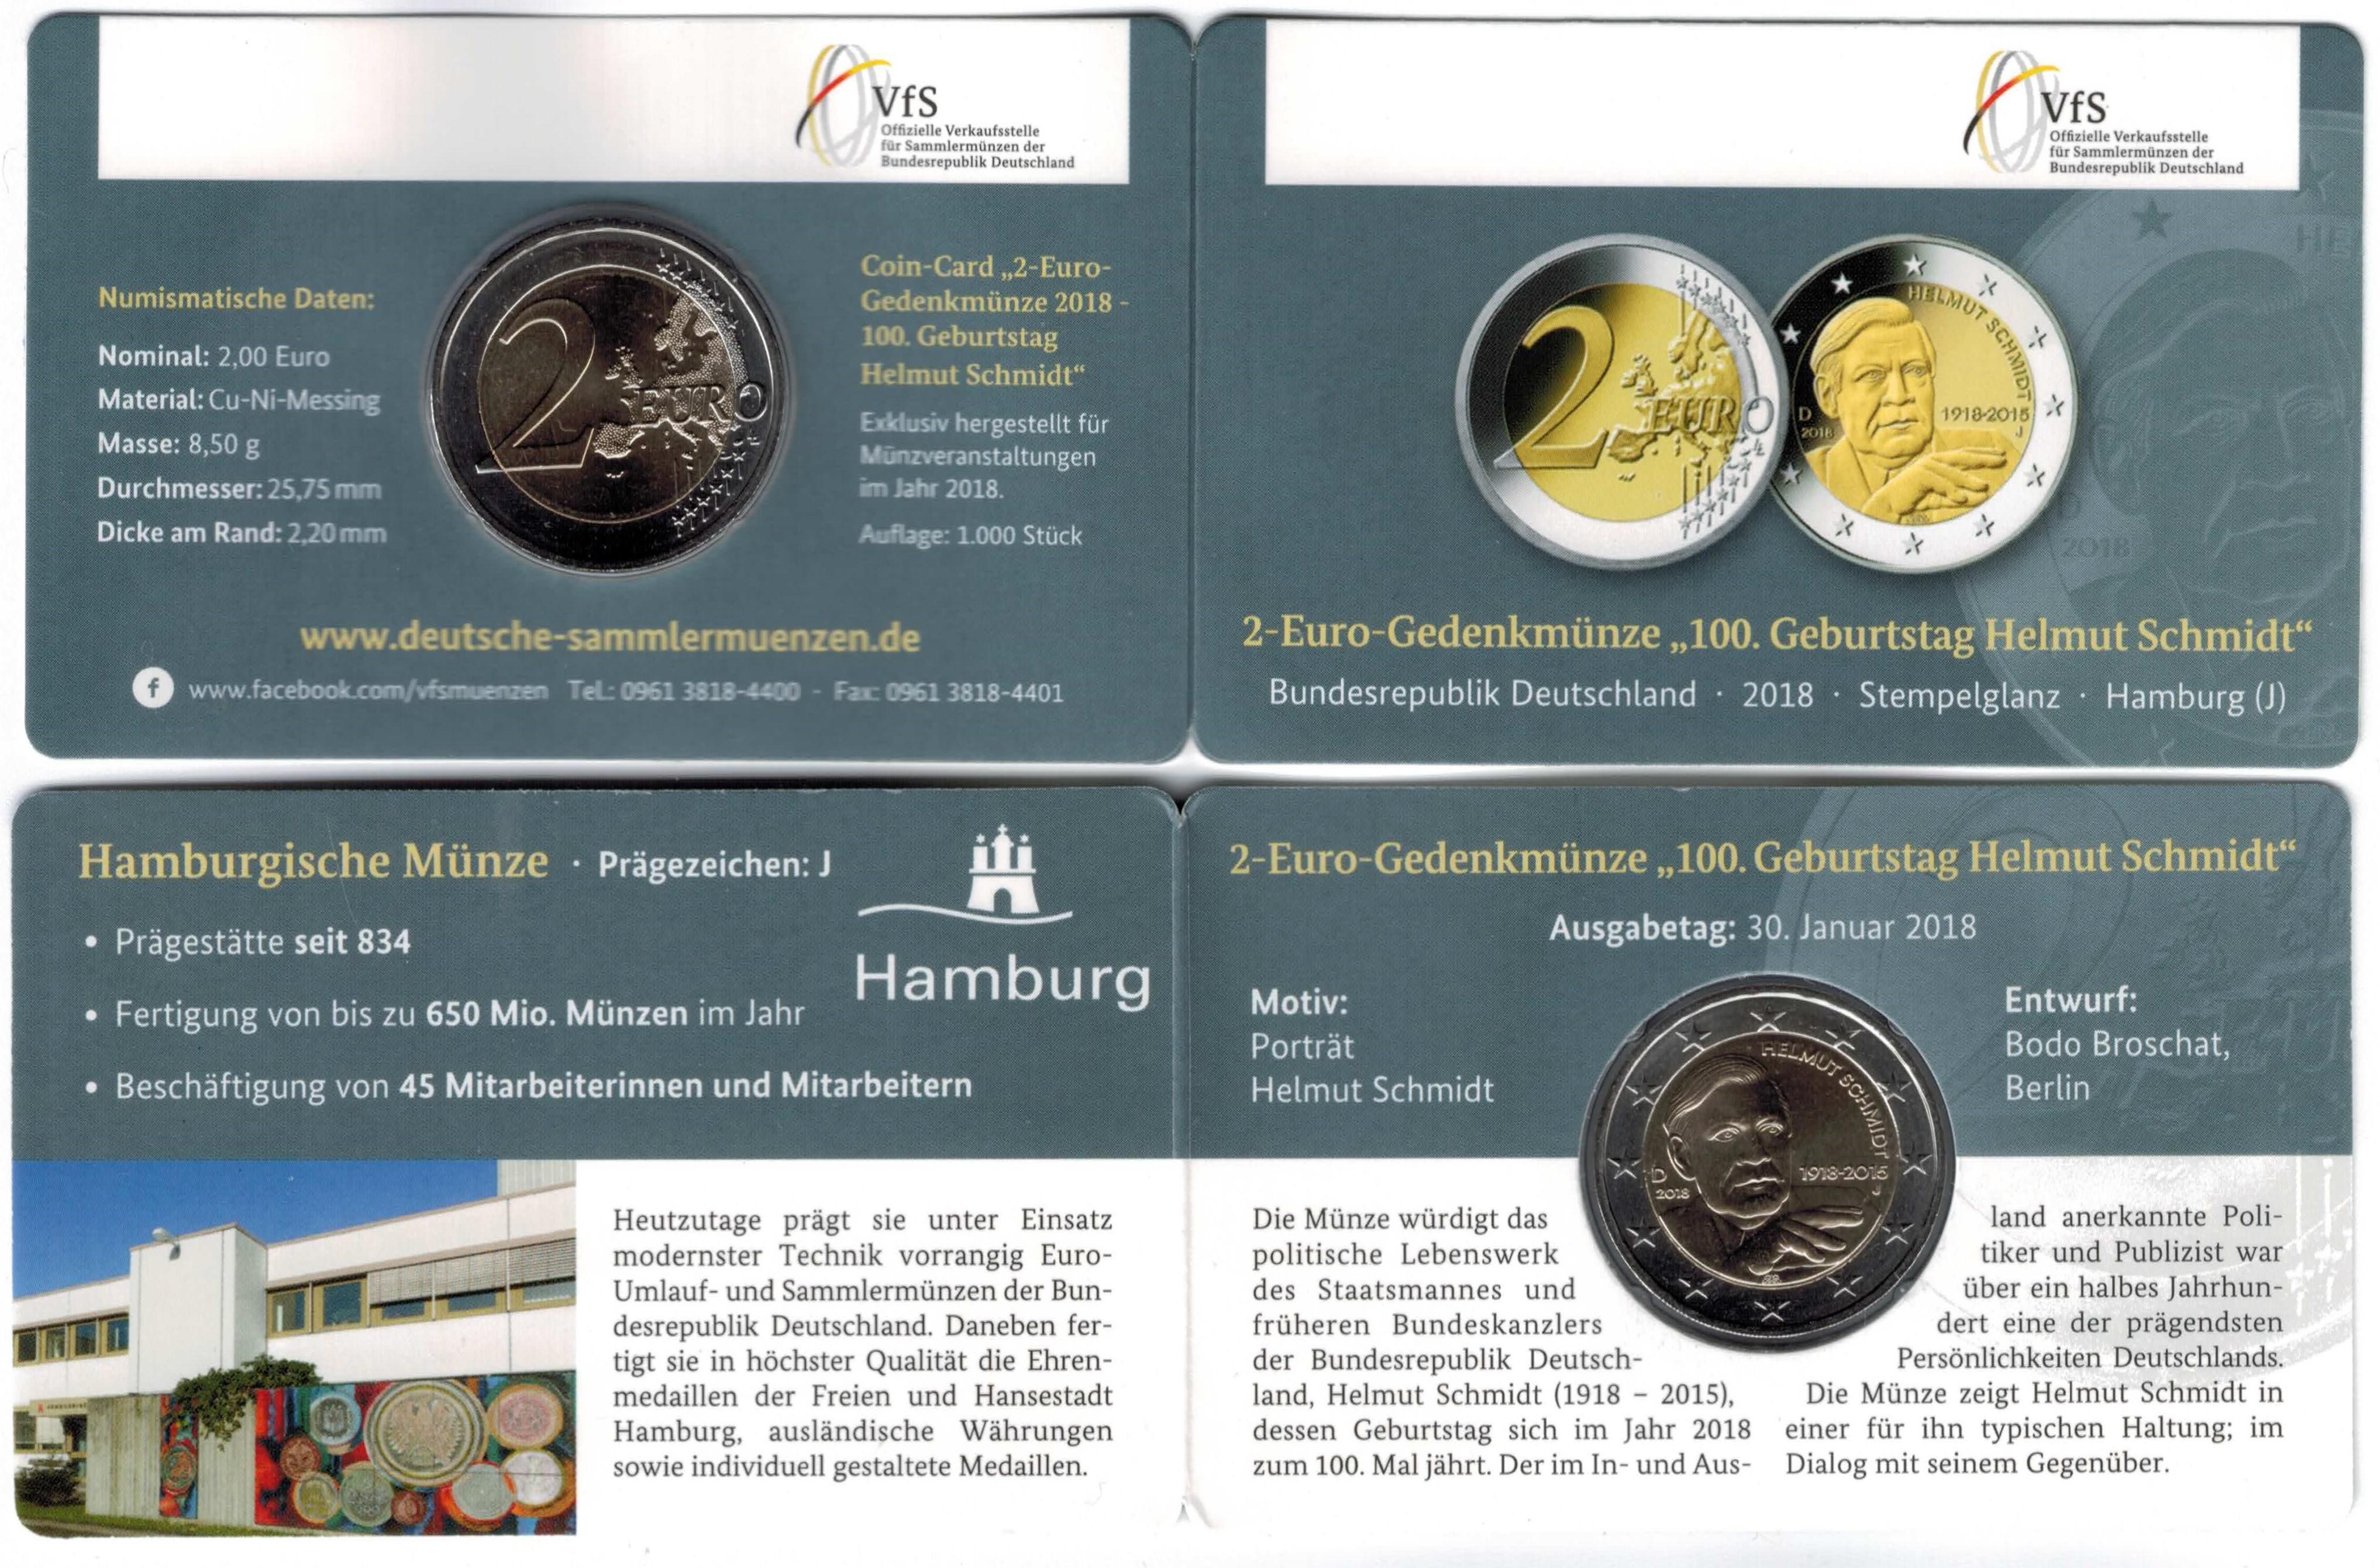 Deutschland 2 Euro 2018 Coincard Helmut Schmidt Eurocoinhouse